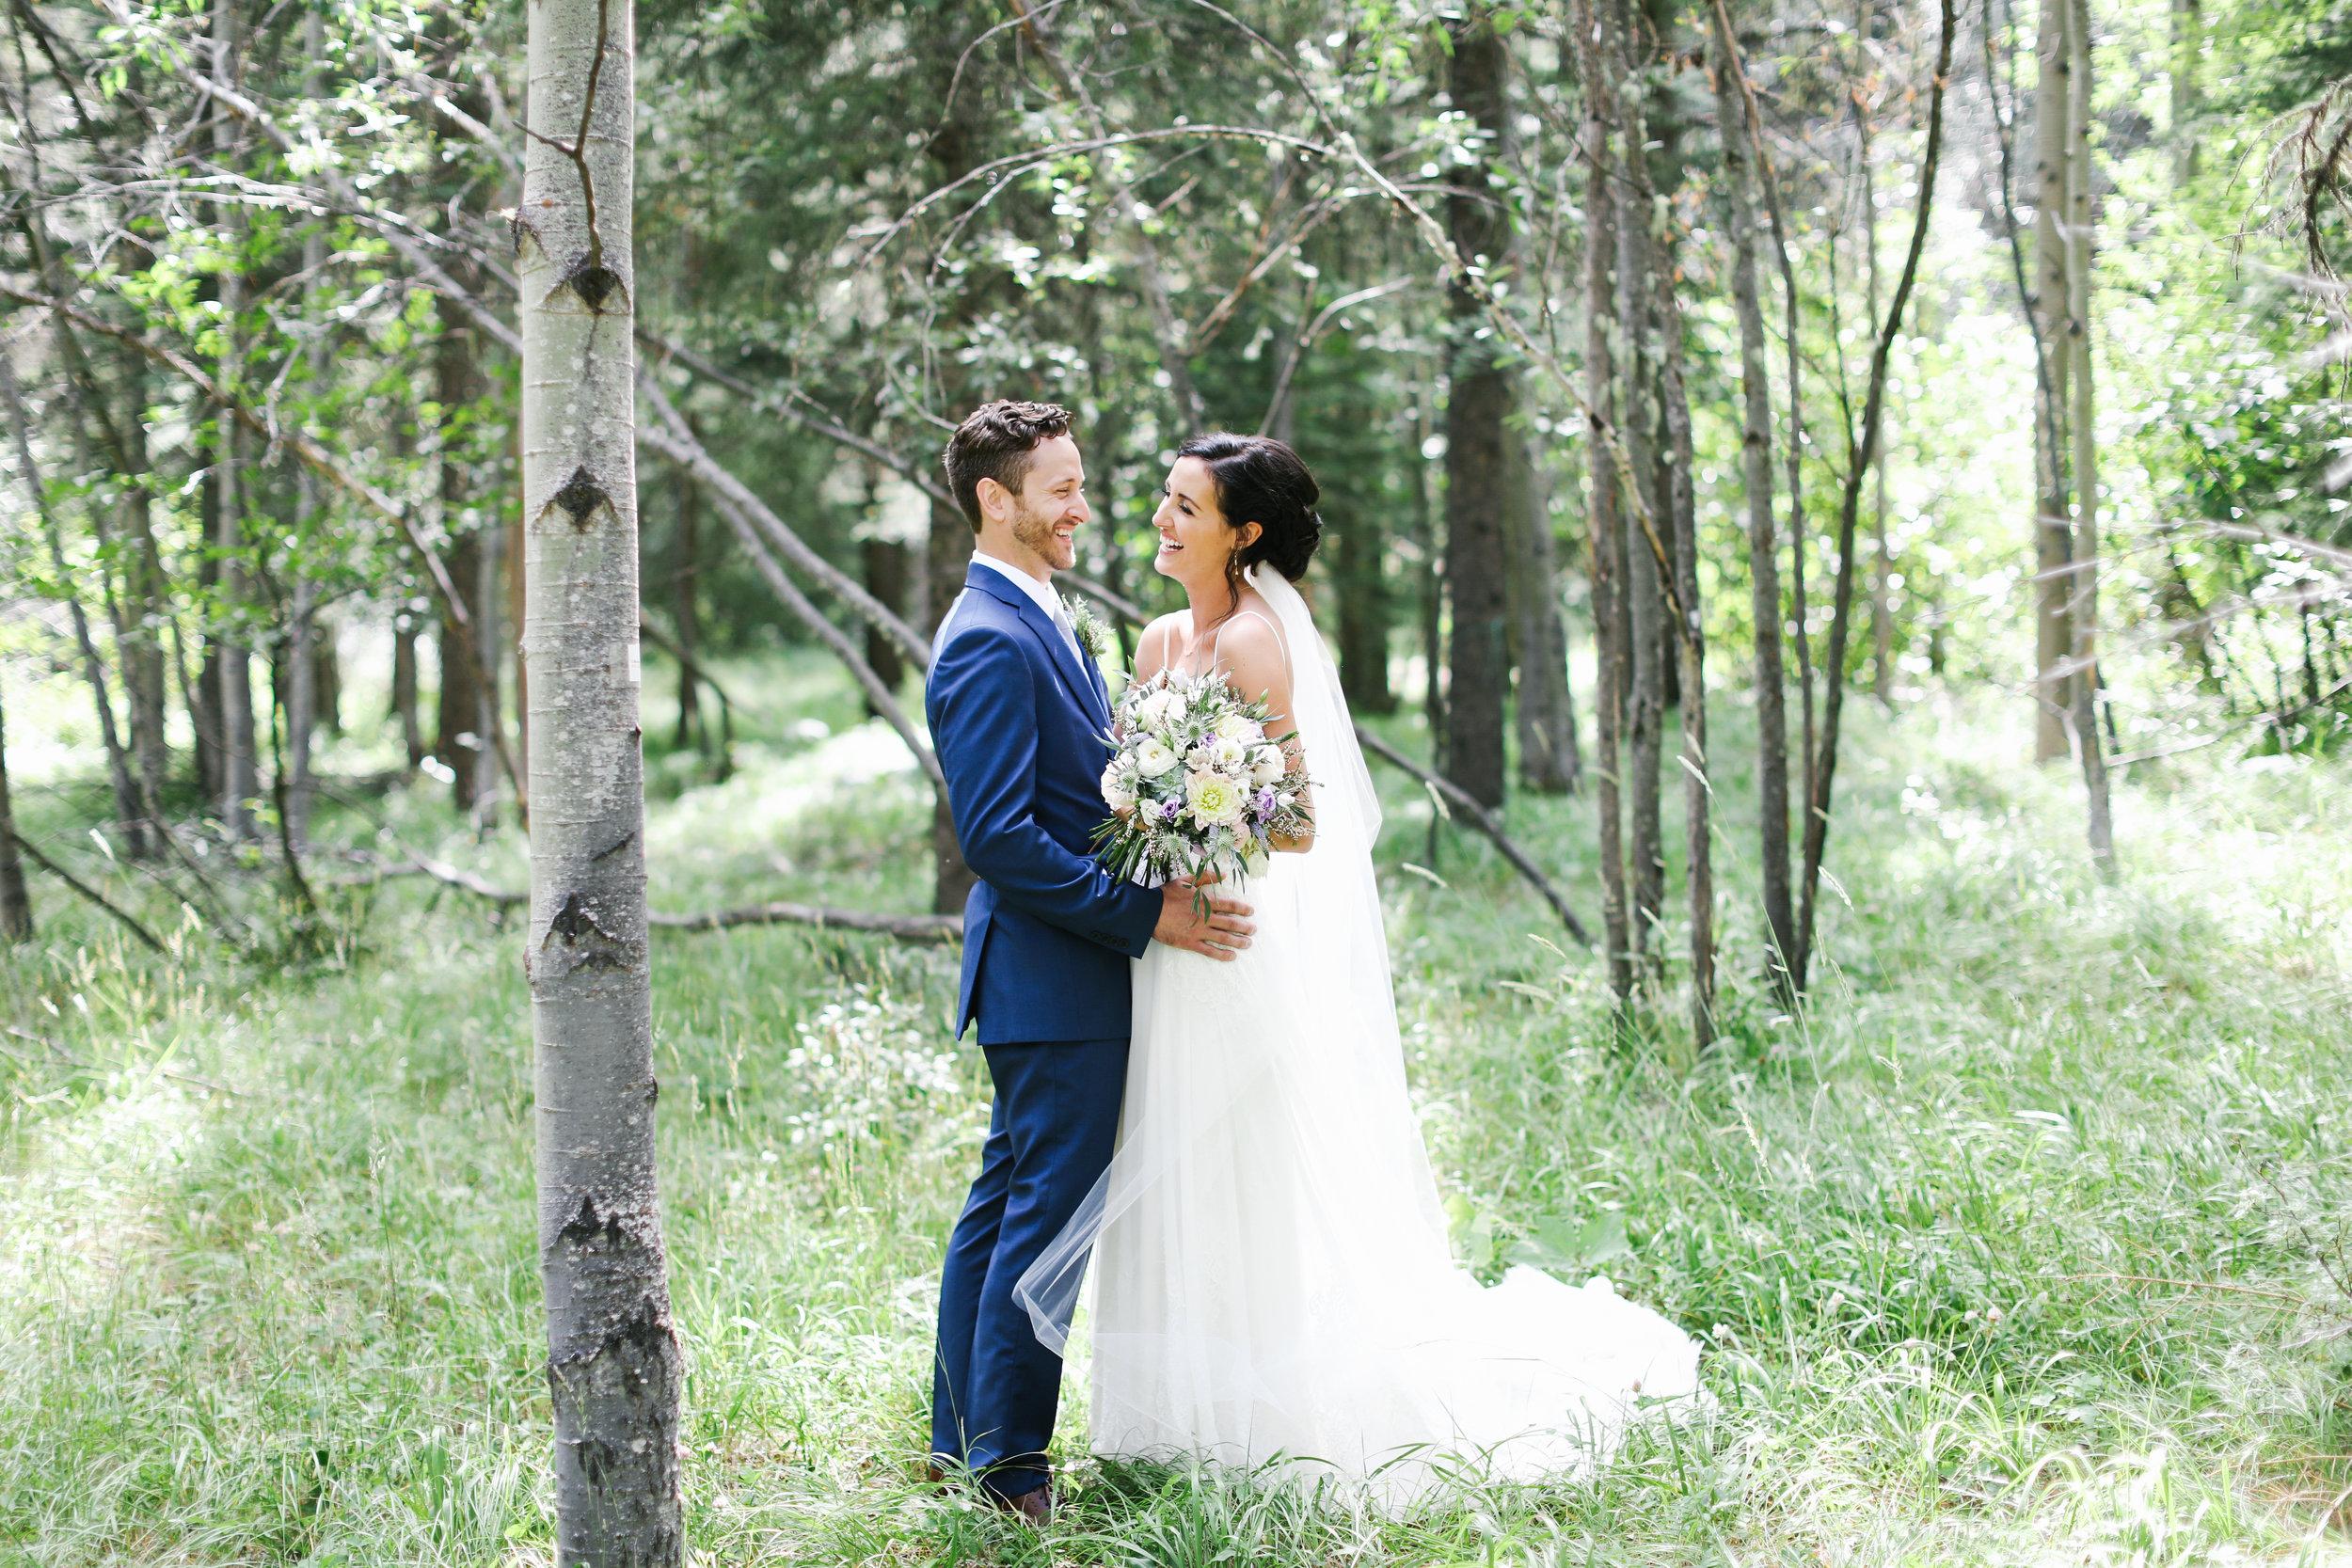 Nate & Colleen Wedding Previews-43.jpg